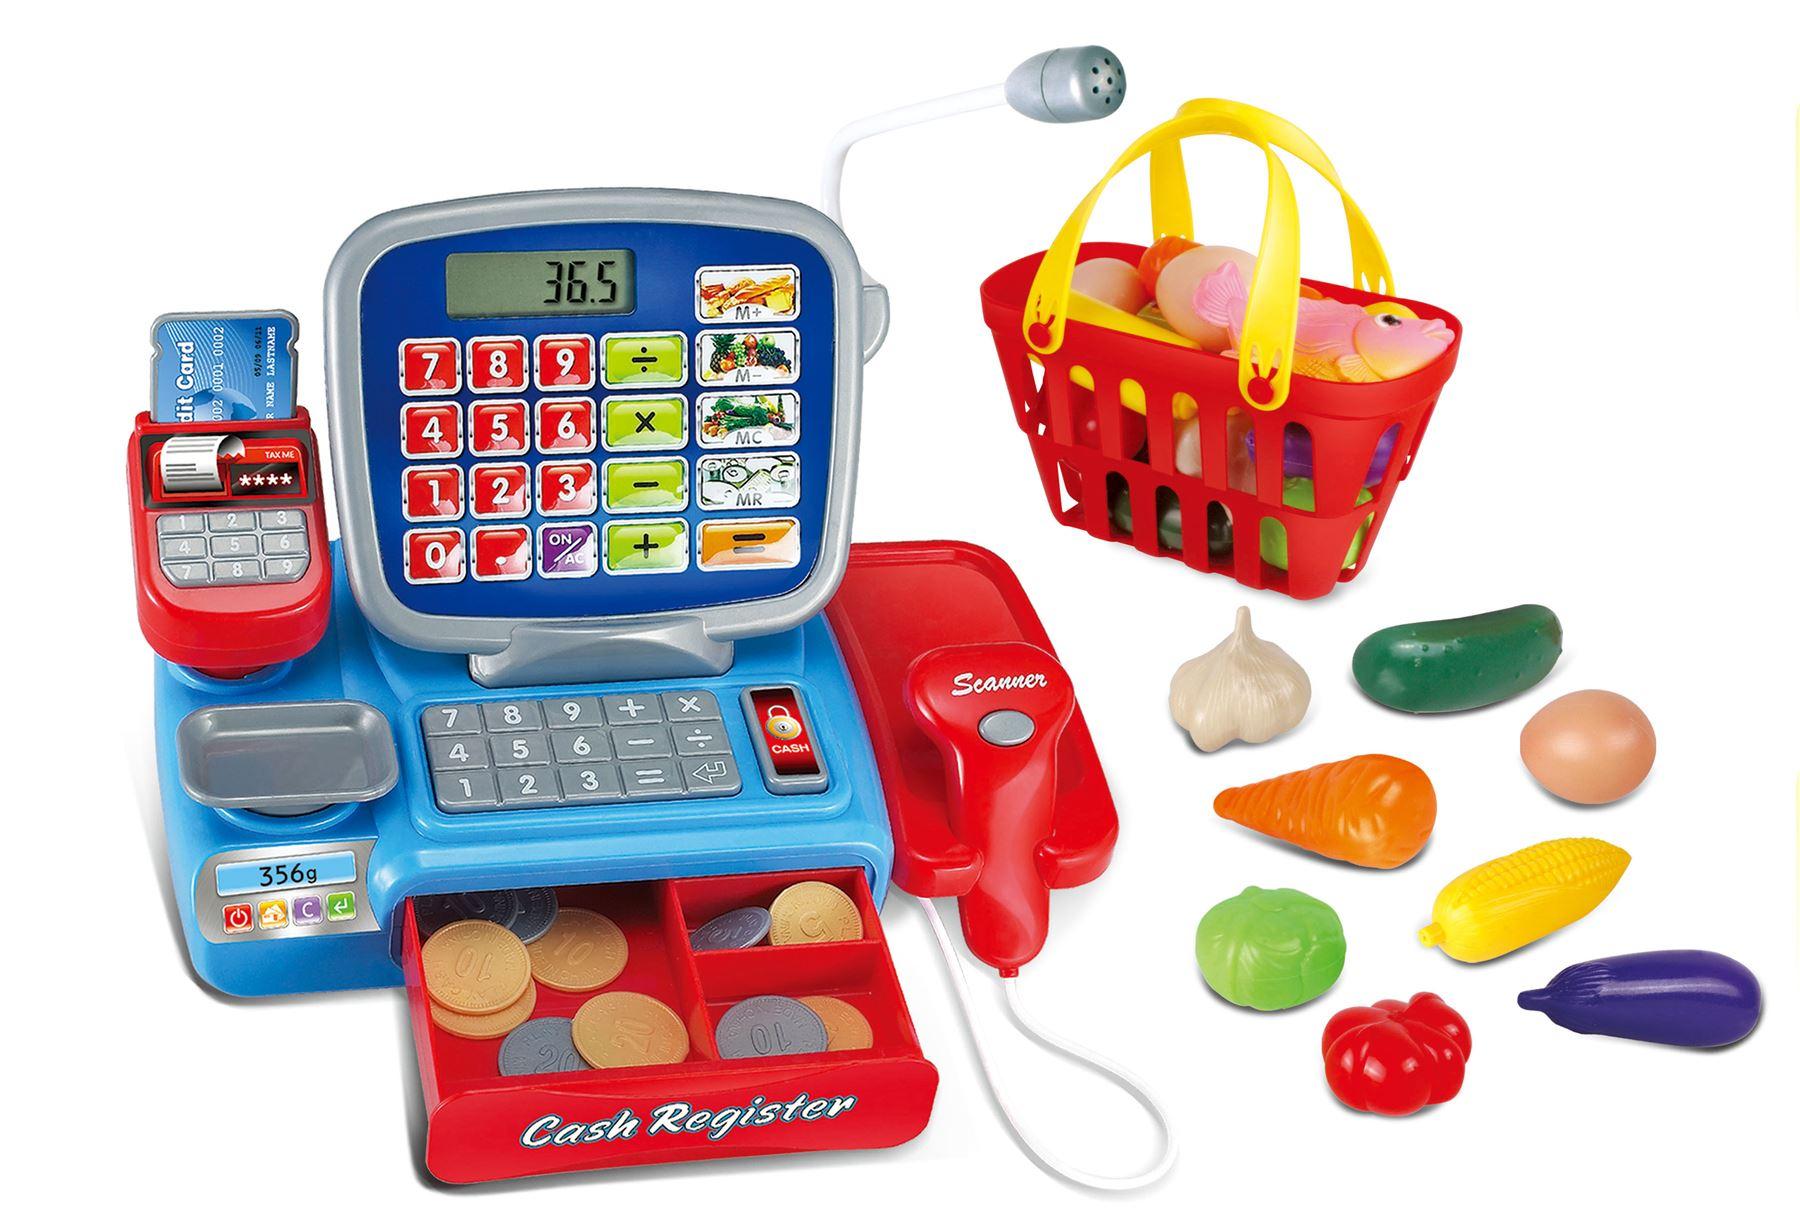 Deluxe Toy Cash Register : Vinsani kids shopping cart electronic cash register